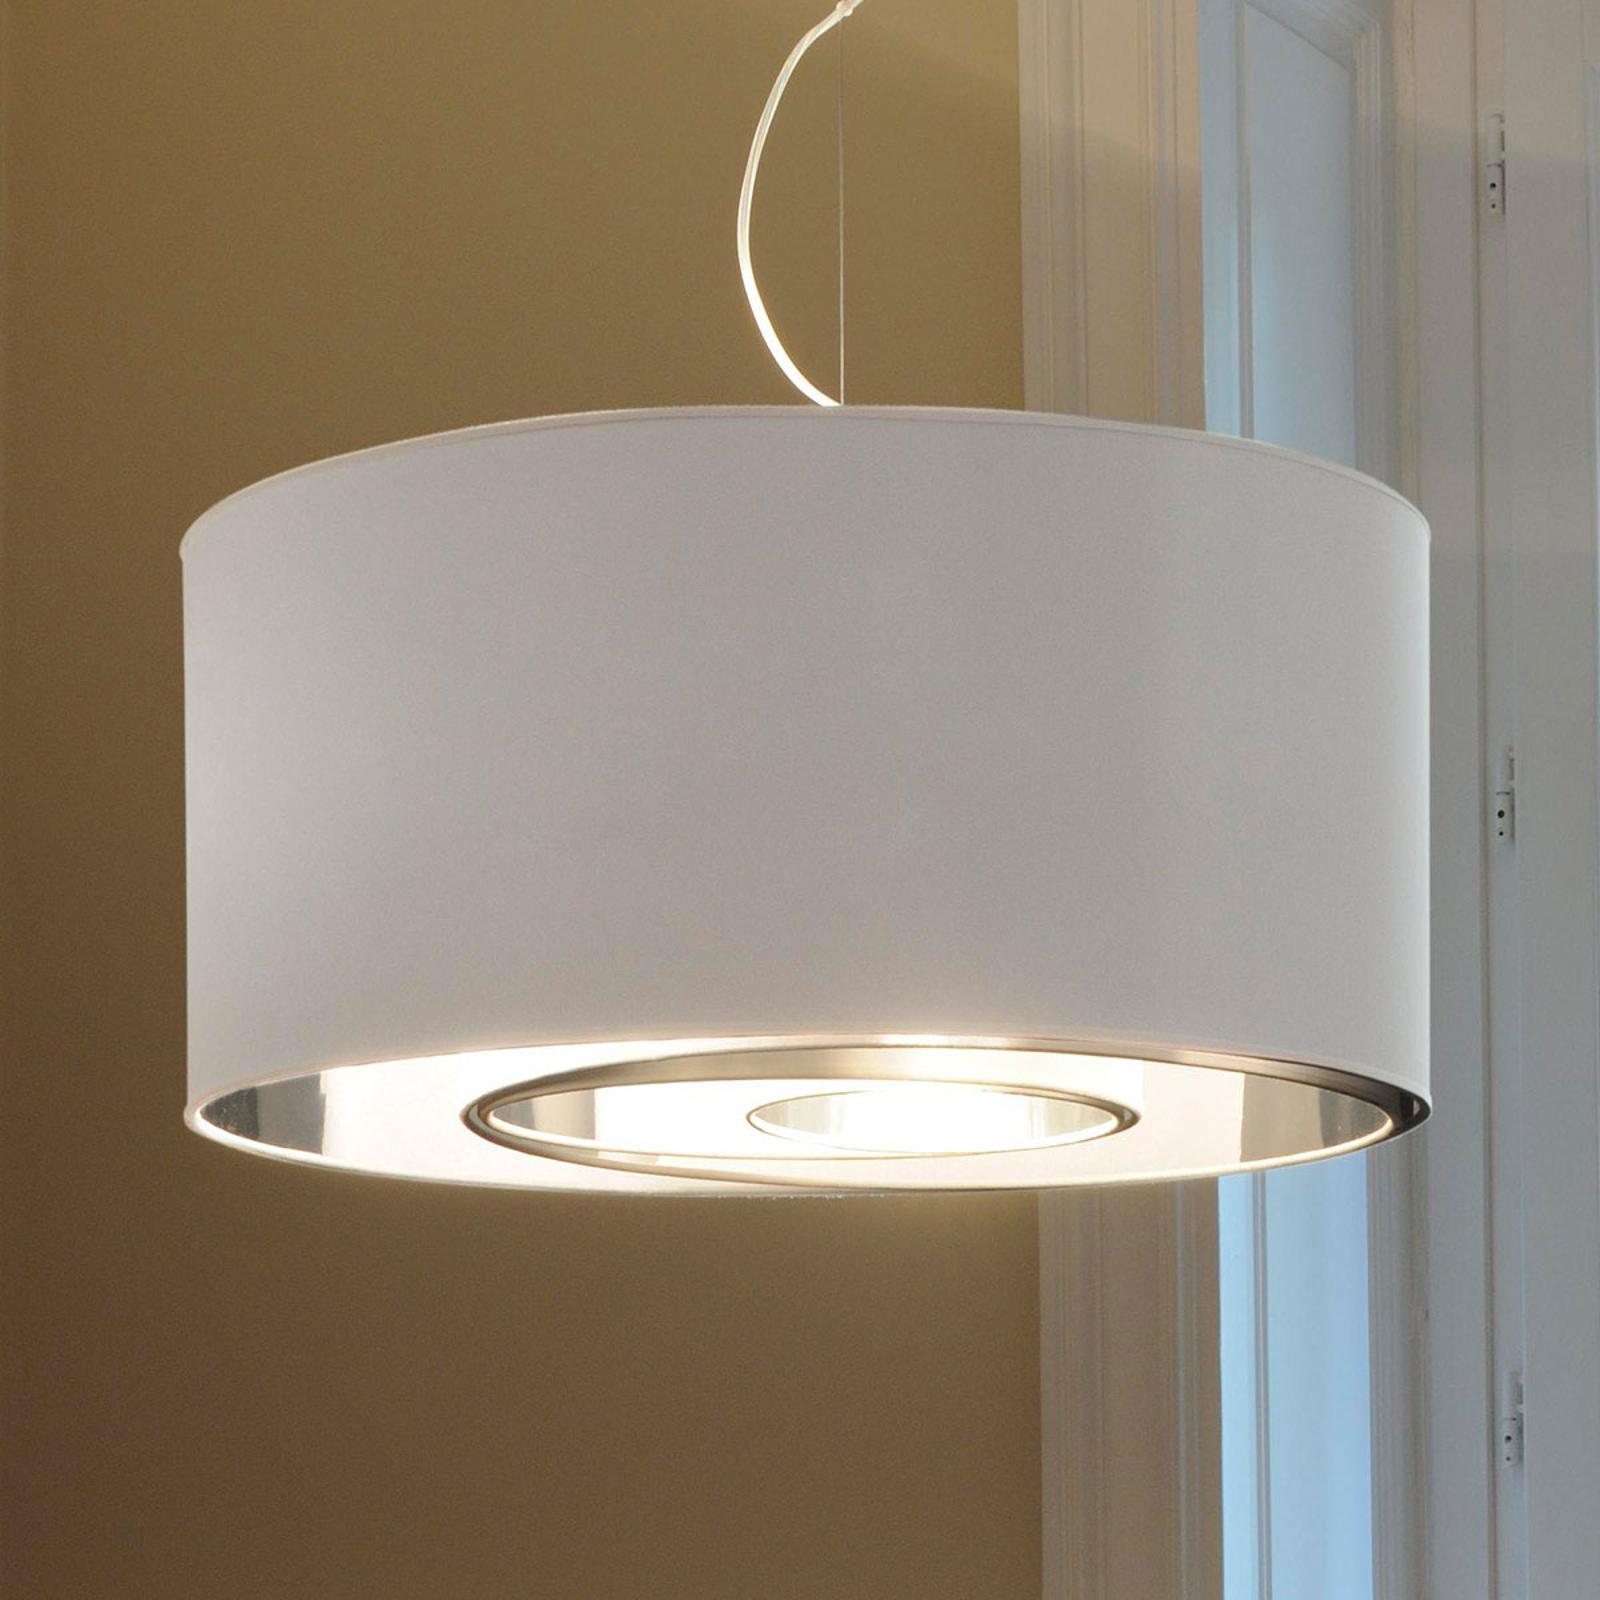 Lampada a sospensione Circles 65 cm